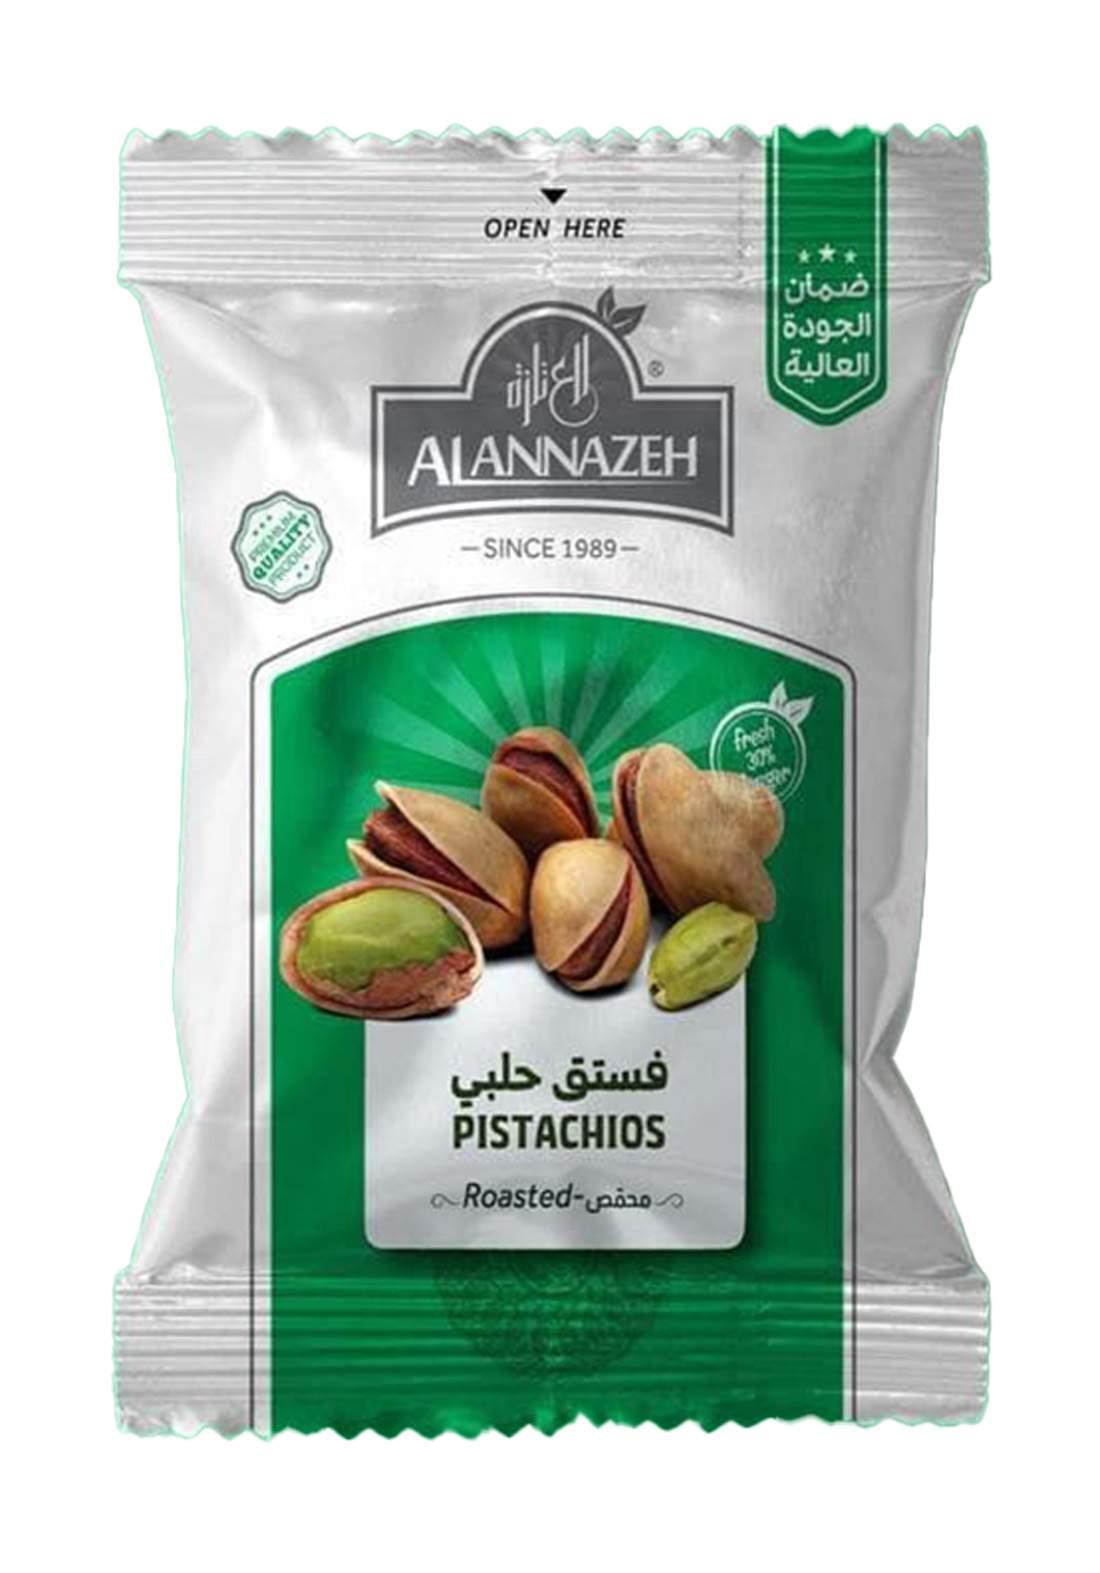 Al-Annazeh Halabi Pistachio Nuts 90g فستق حلبي